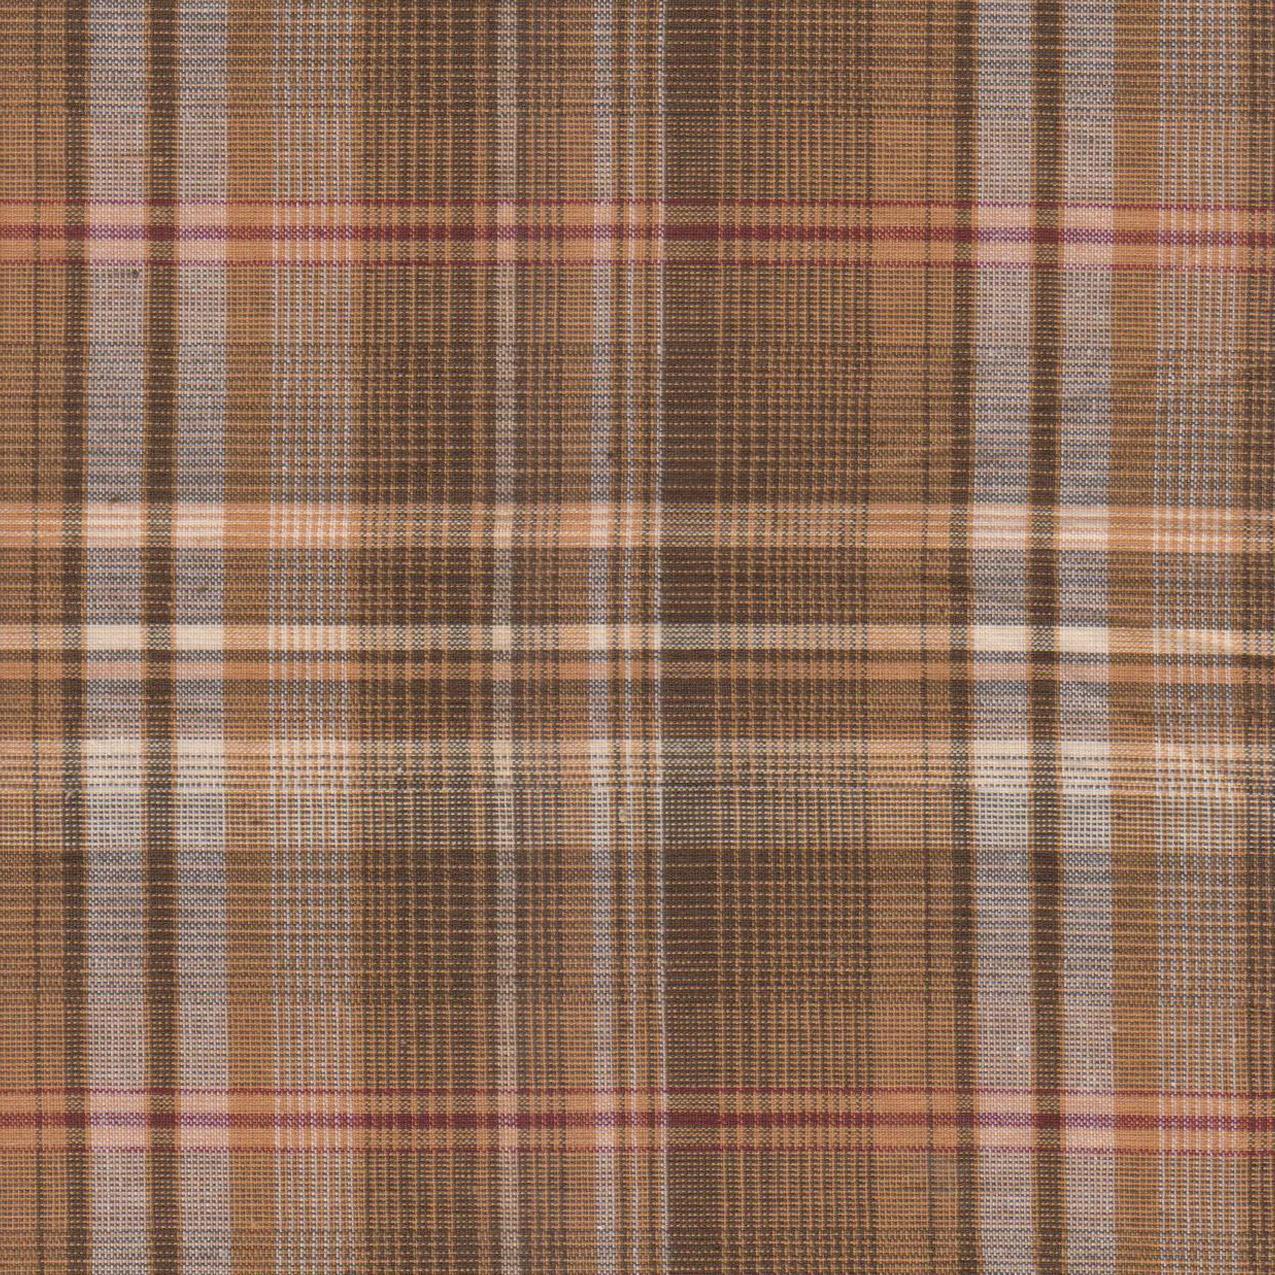 "Dark and Light Brown Plaid Fabric Swatch 4"" x 4"""